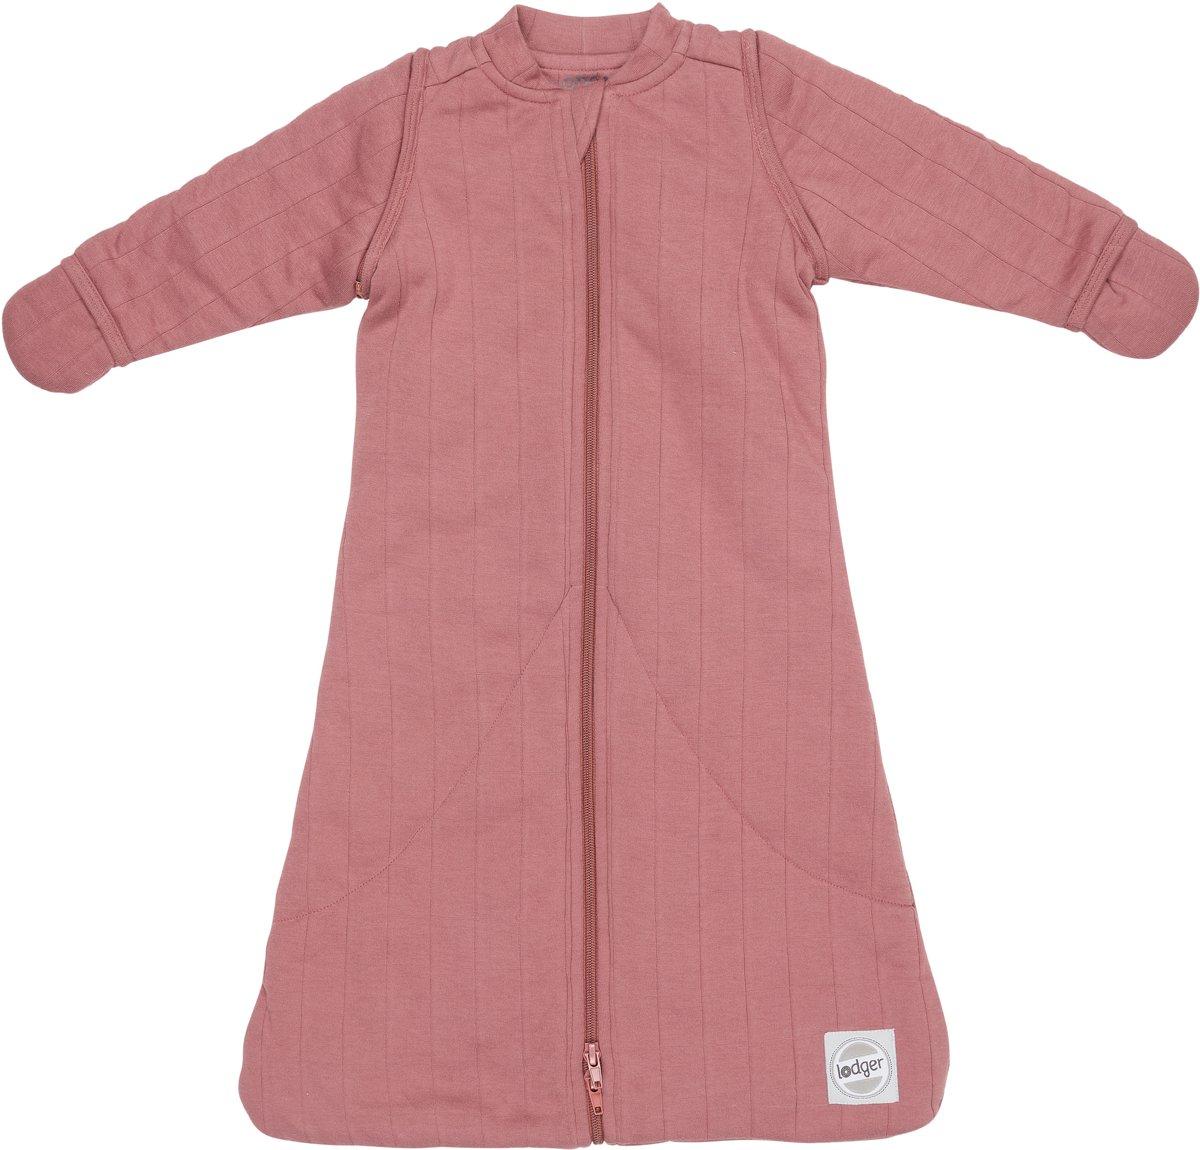 Lodger Baby slaapzak - Hopper Sleeves Solid - Roze - Lange mouw - 50/62